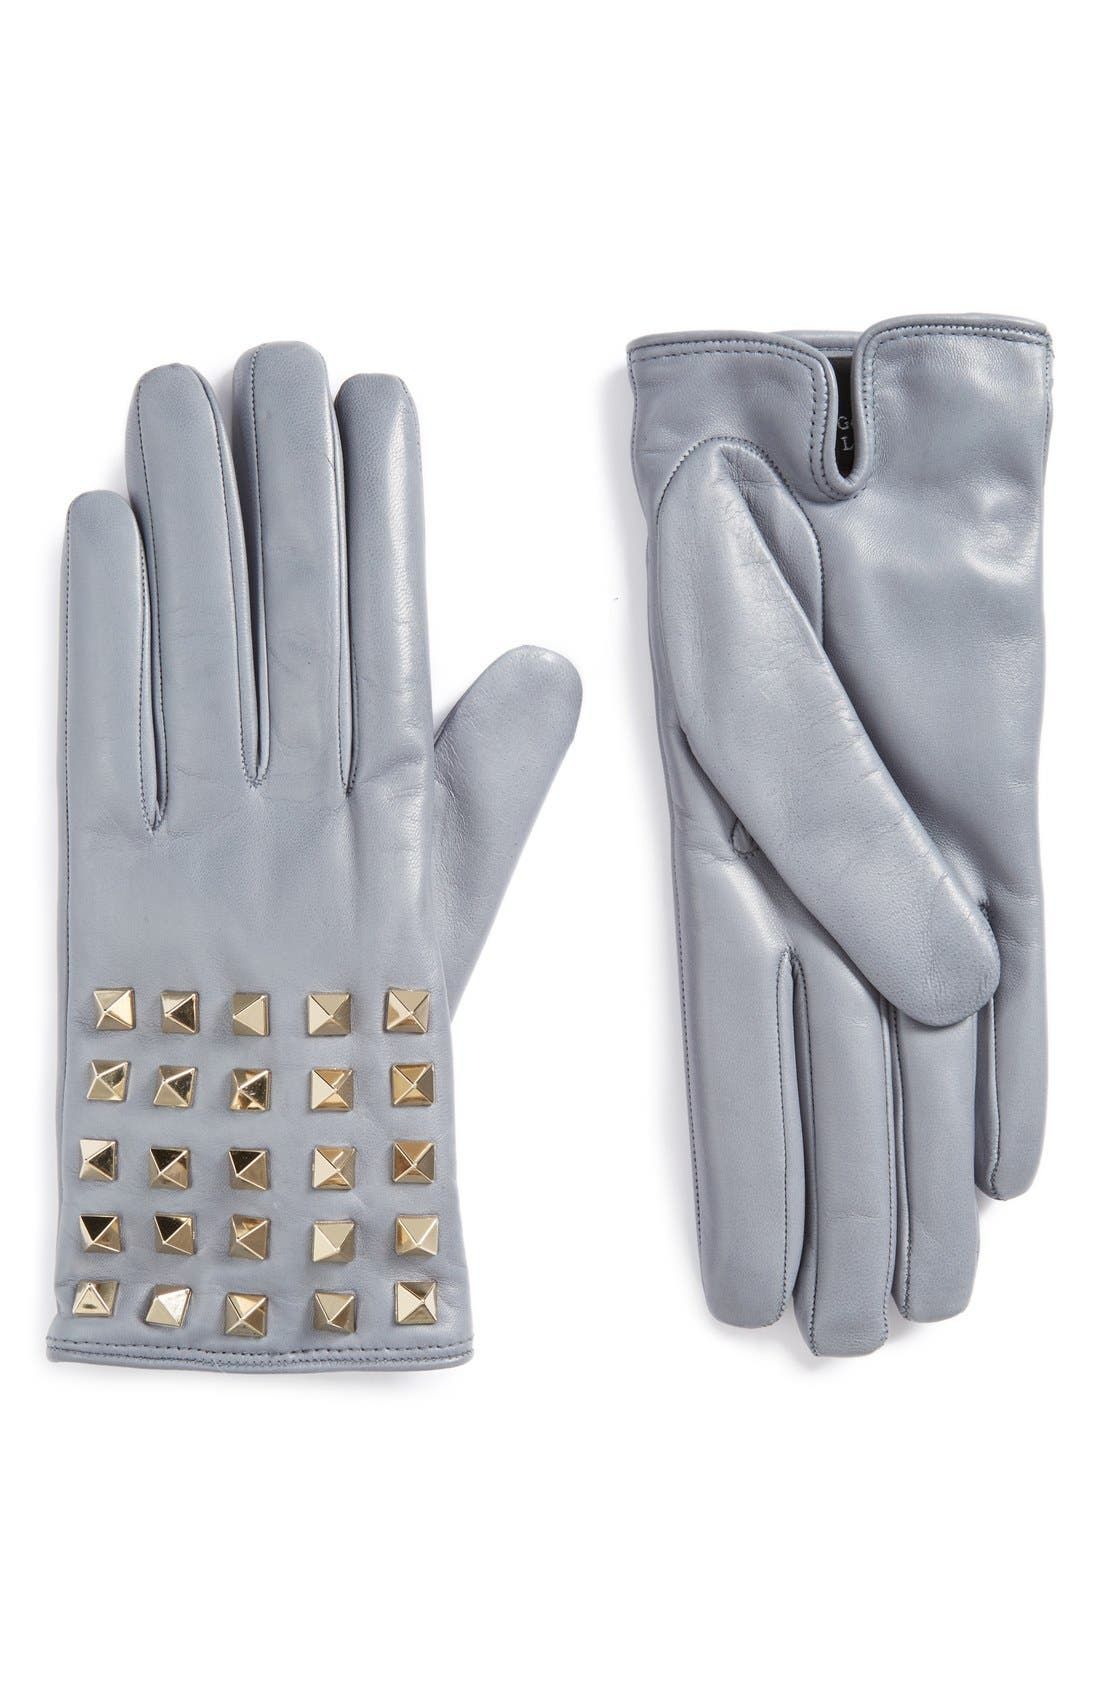 GARAVANI Rockstud Leather Gloves,                         Main,                         color, Powder